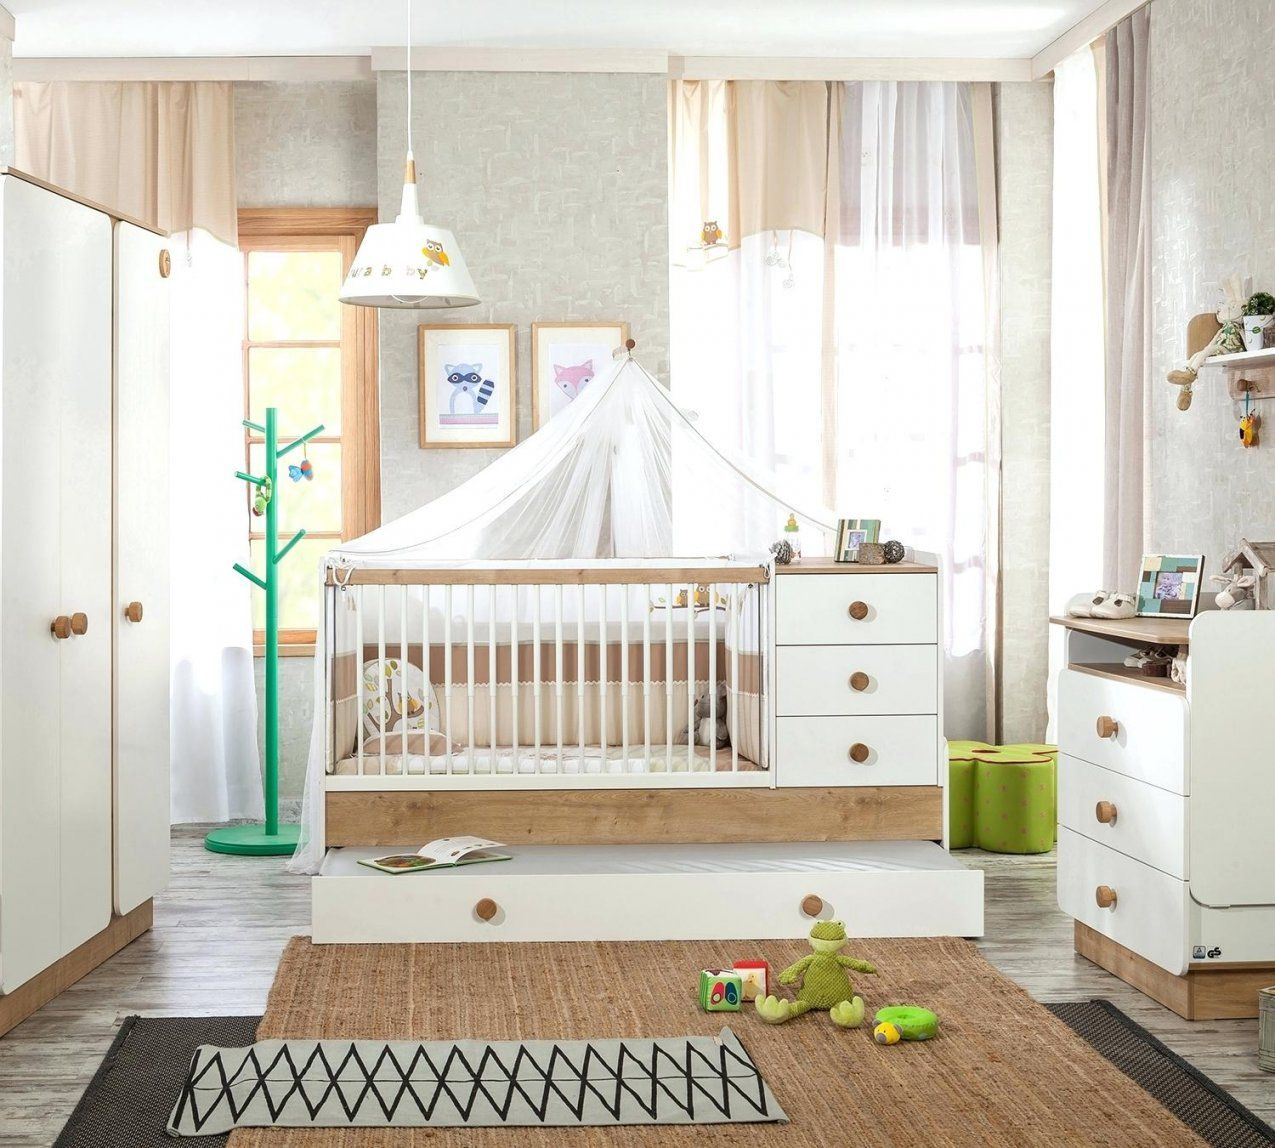 Baby Komplettzimmer Baby Komplettzimmer 3 Teilig Billige Baby von Baby Komplettzimmer 3 Teilig Photo